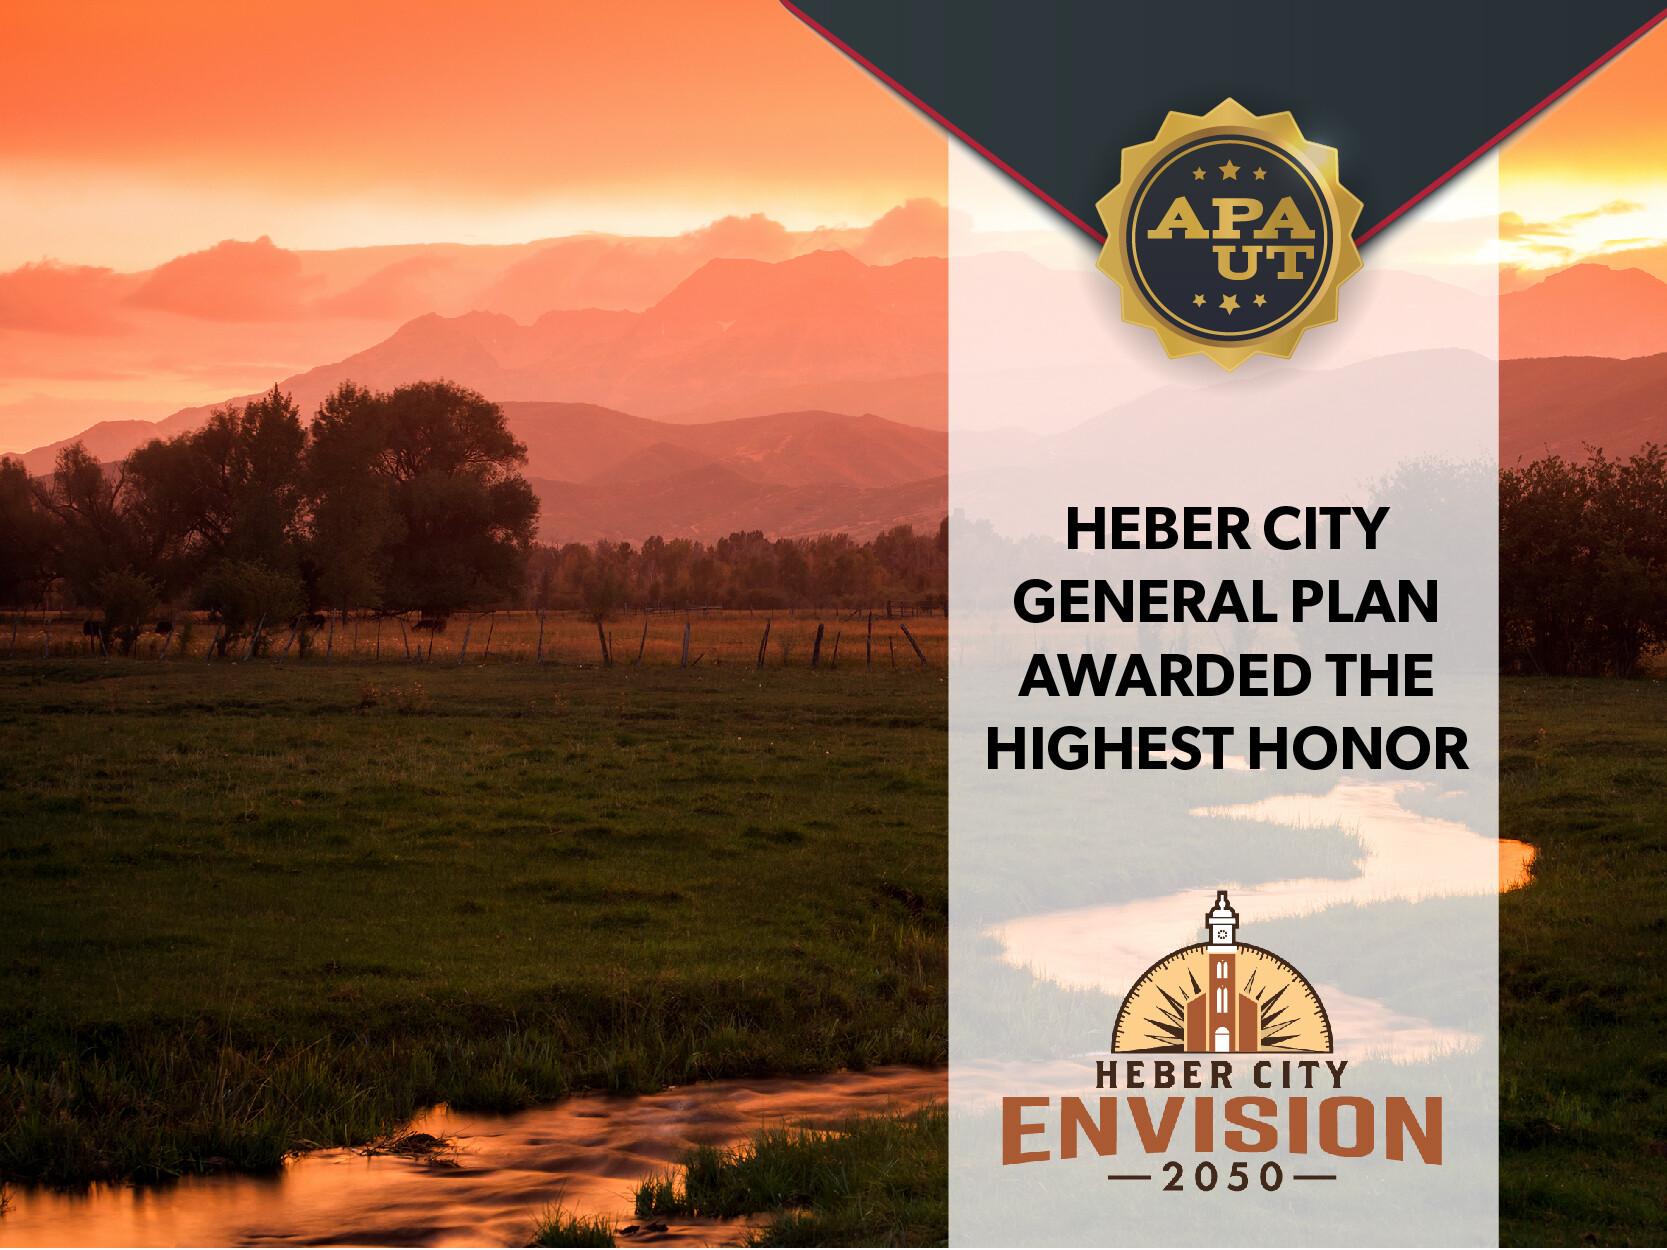 Heber City Envision 2050